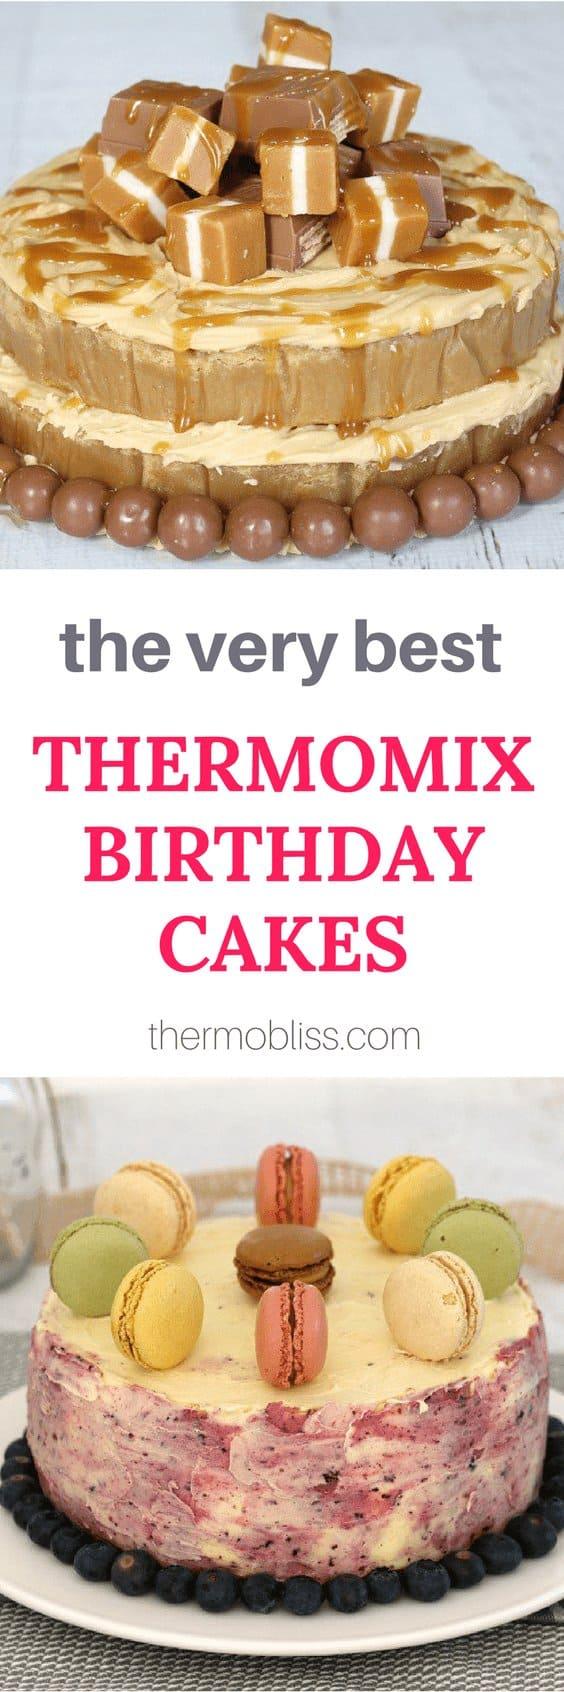 Thermomix Birthday Cakes